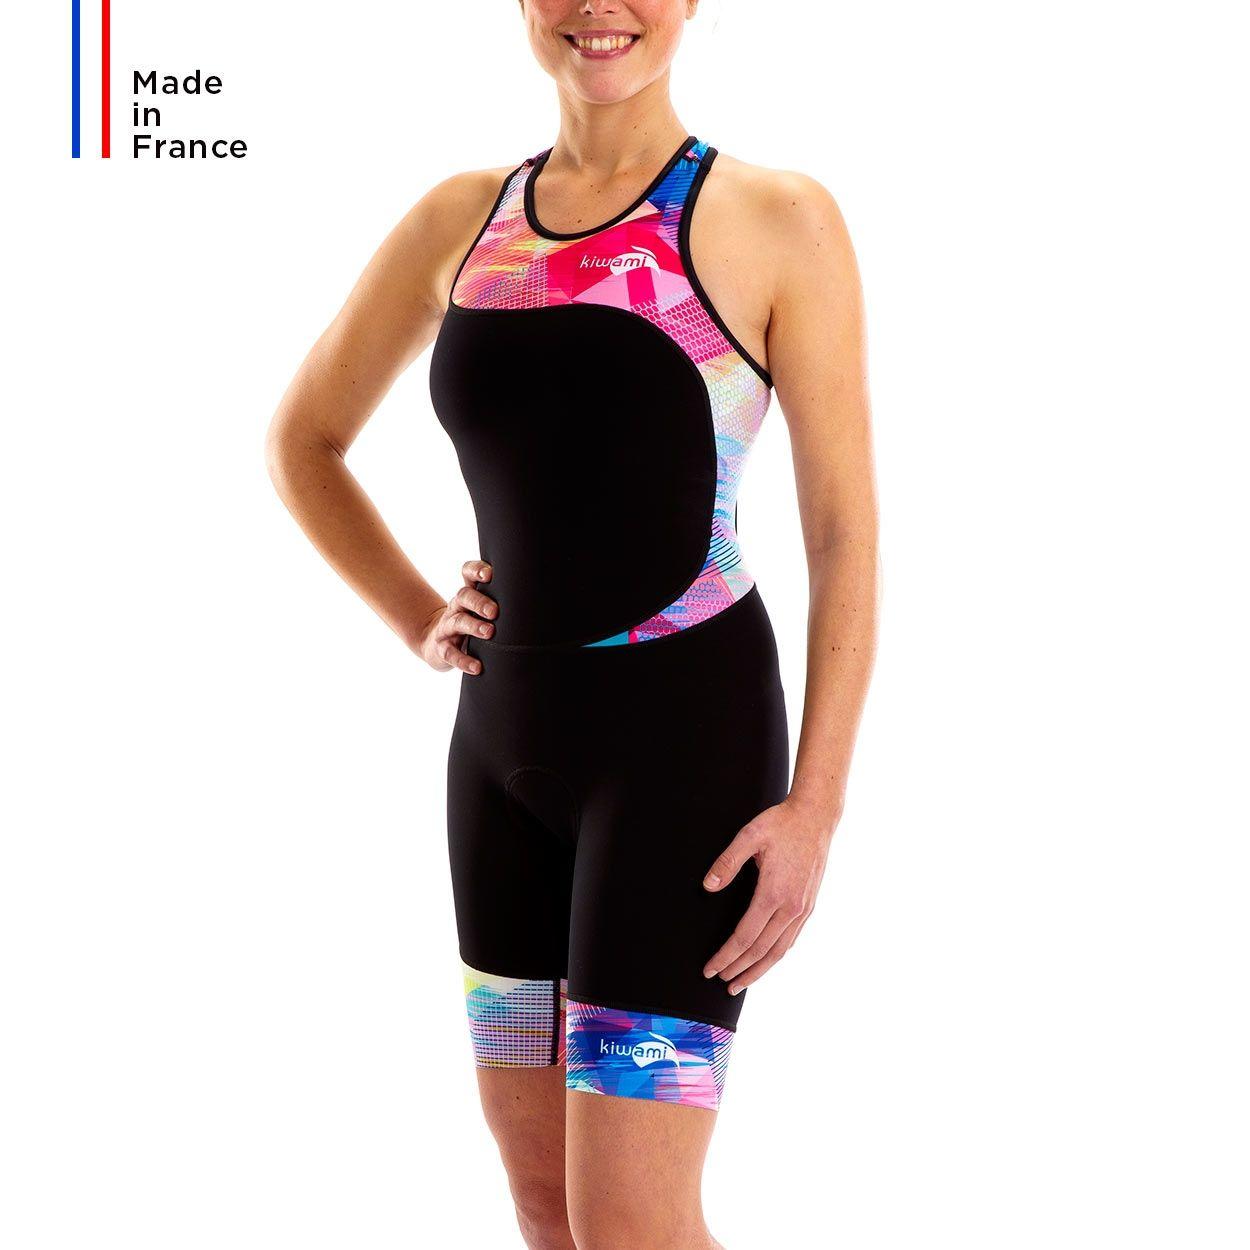 fc2442f3cc3f8f women trisuit openback tokyo fujiro 2   KIWAMI - Women's triathlon ...